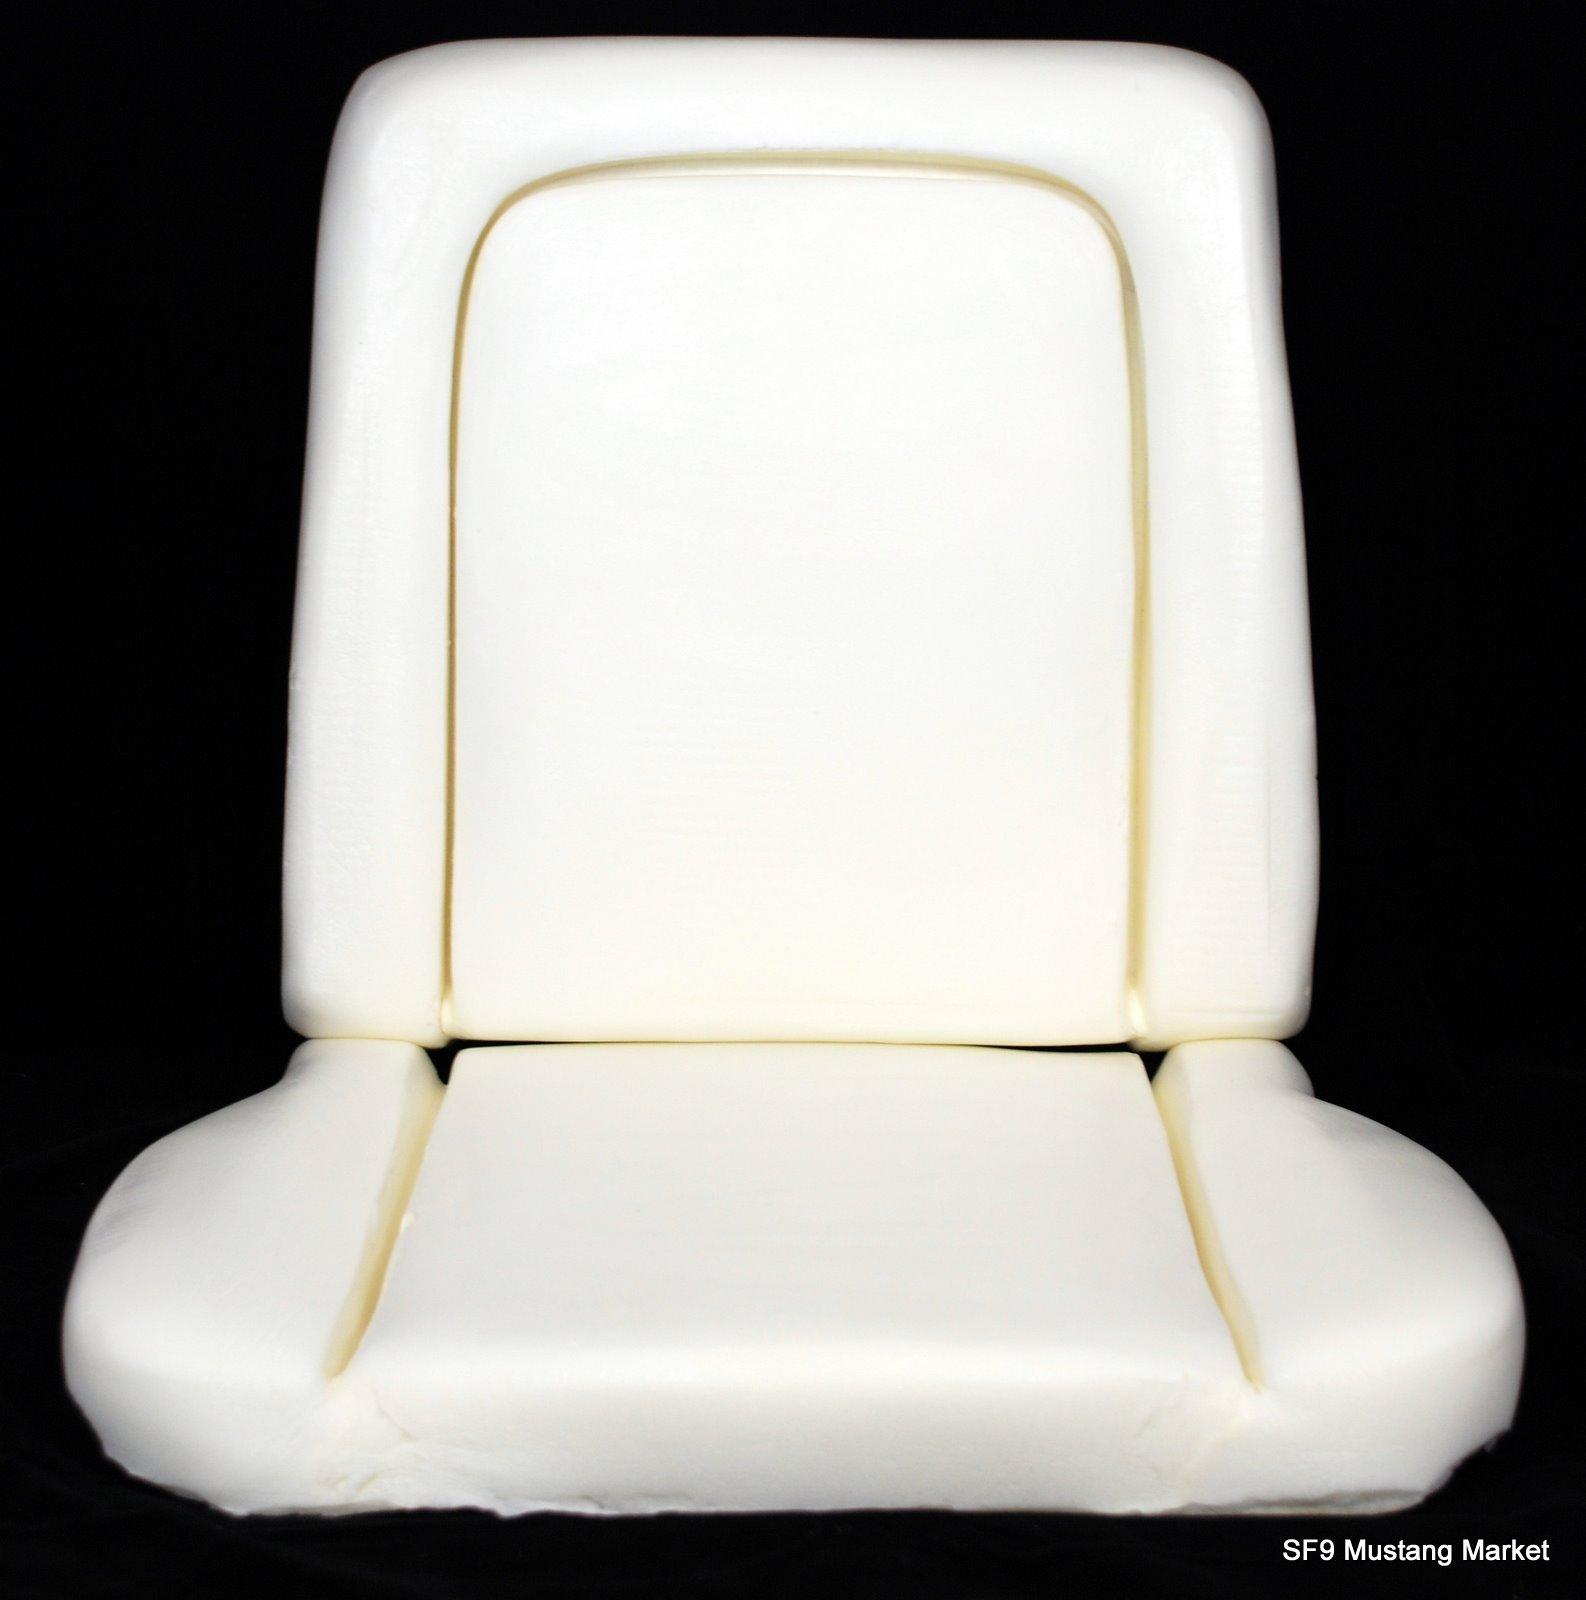 1967 Fairlane Deluxe/ Ranchero Bucket Seat Foam Made By Mustang Market